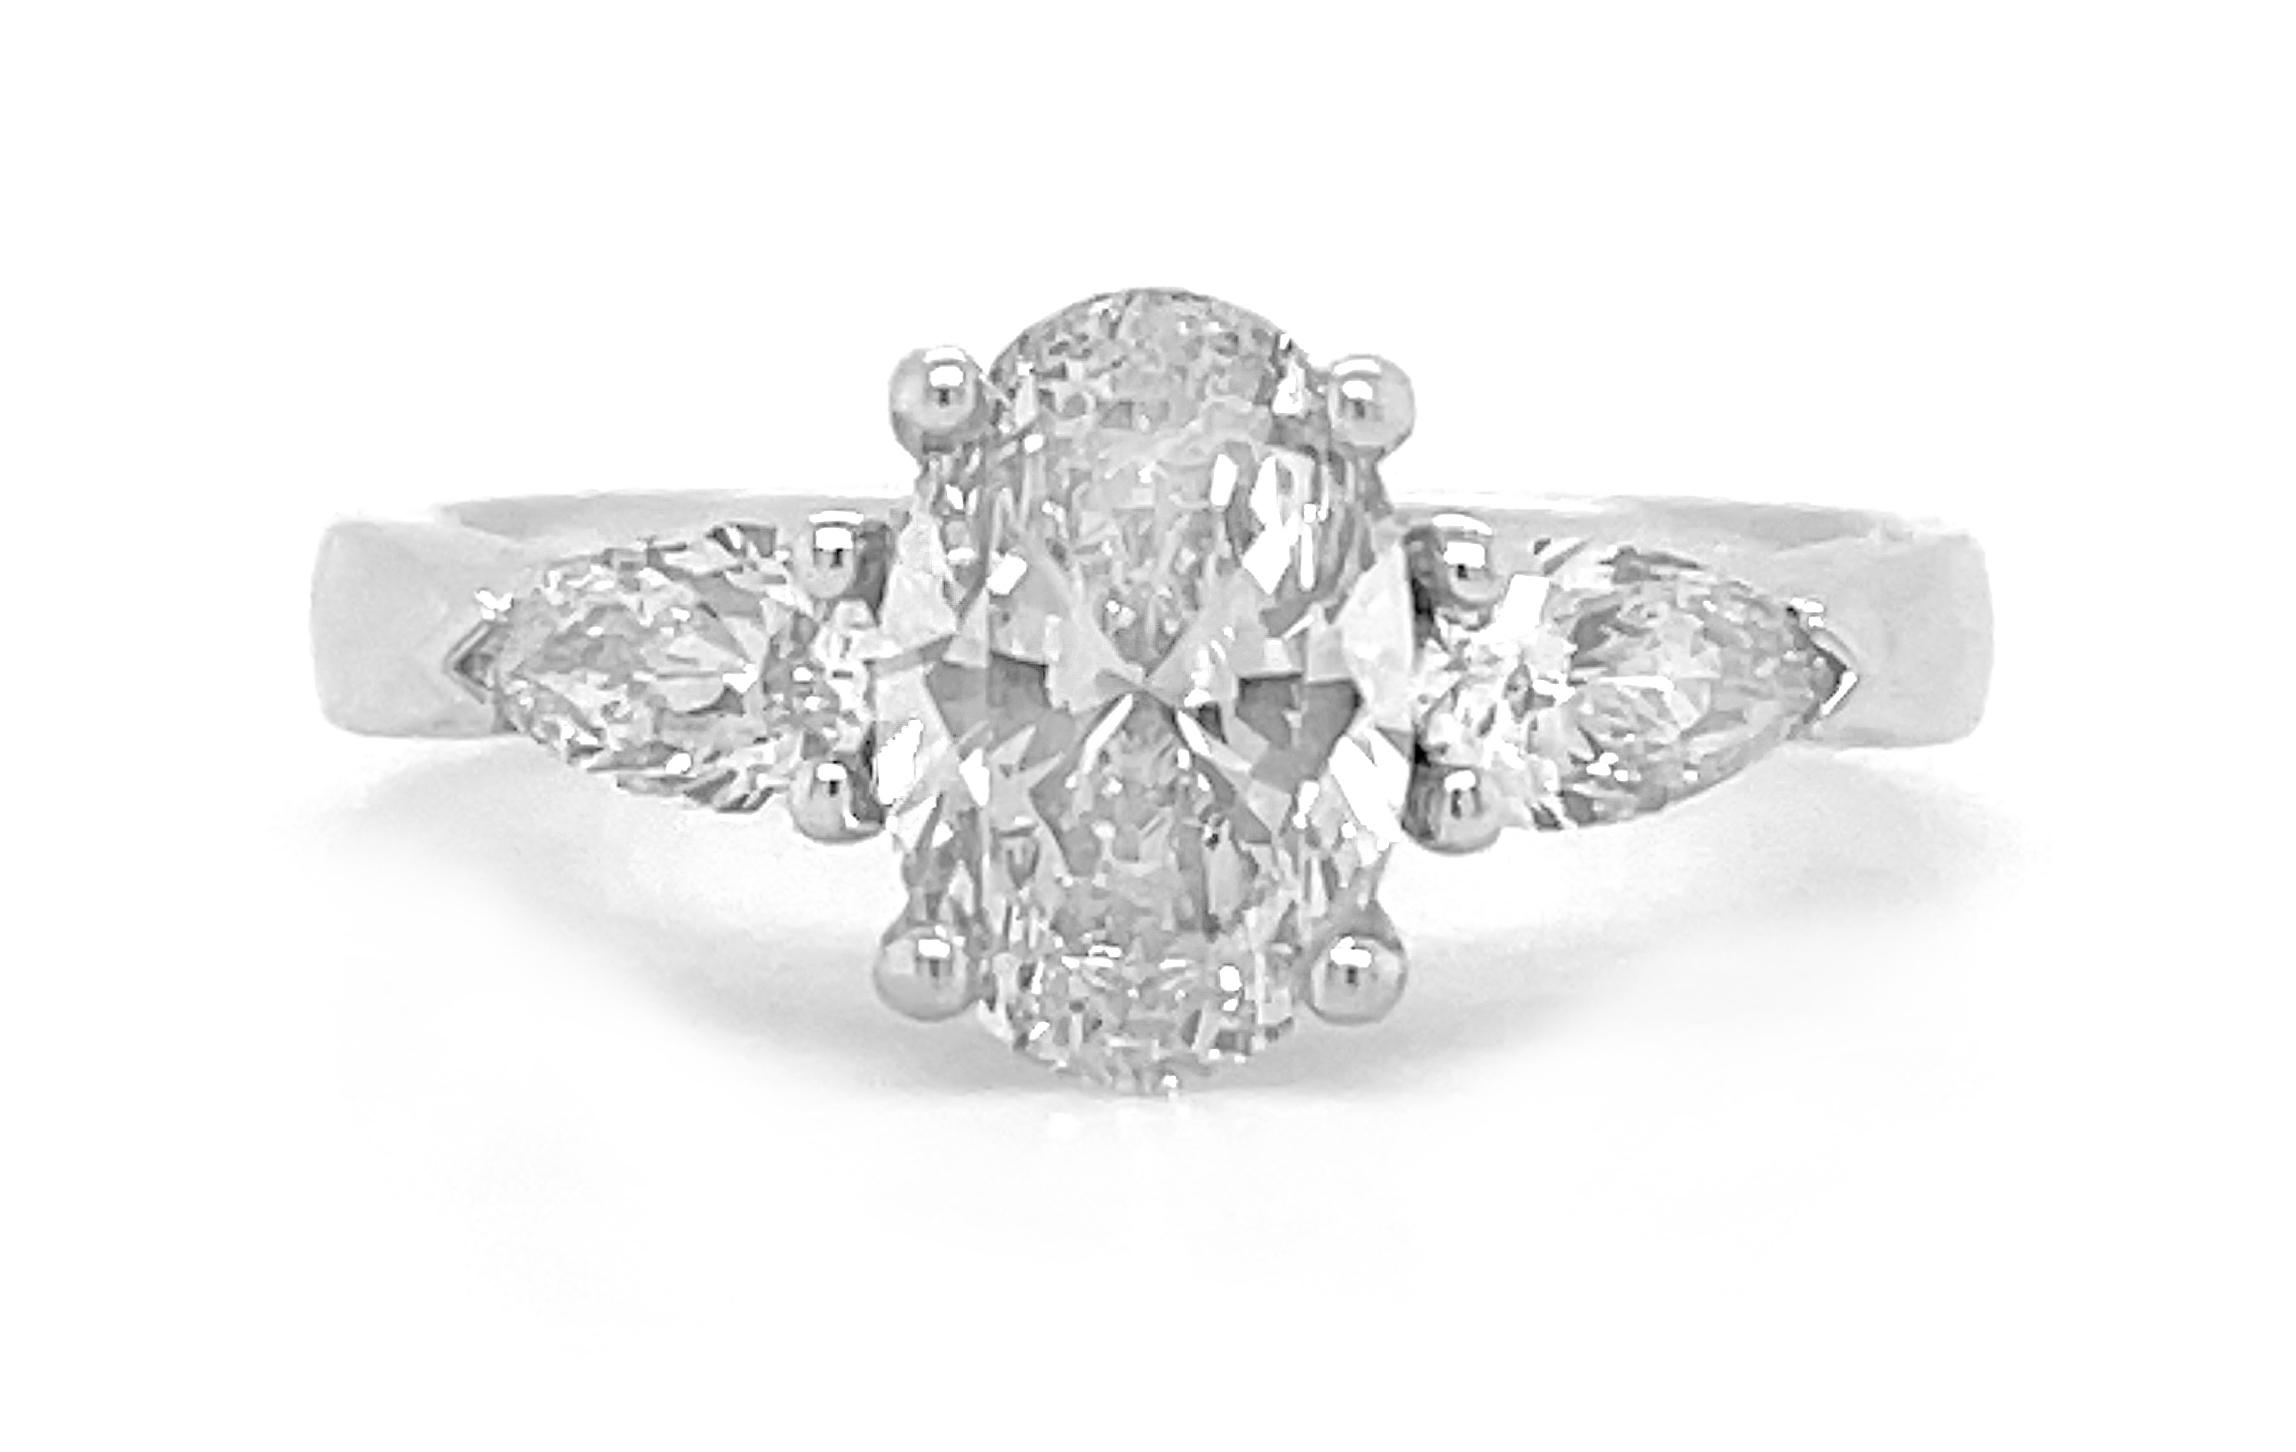 18k White Gold 3 Stone Oval & Pearshape Diamond Ring